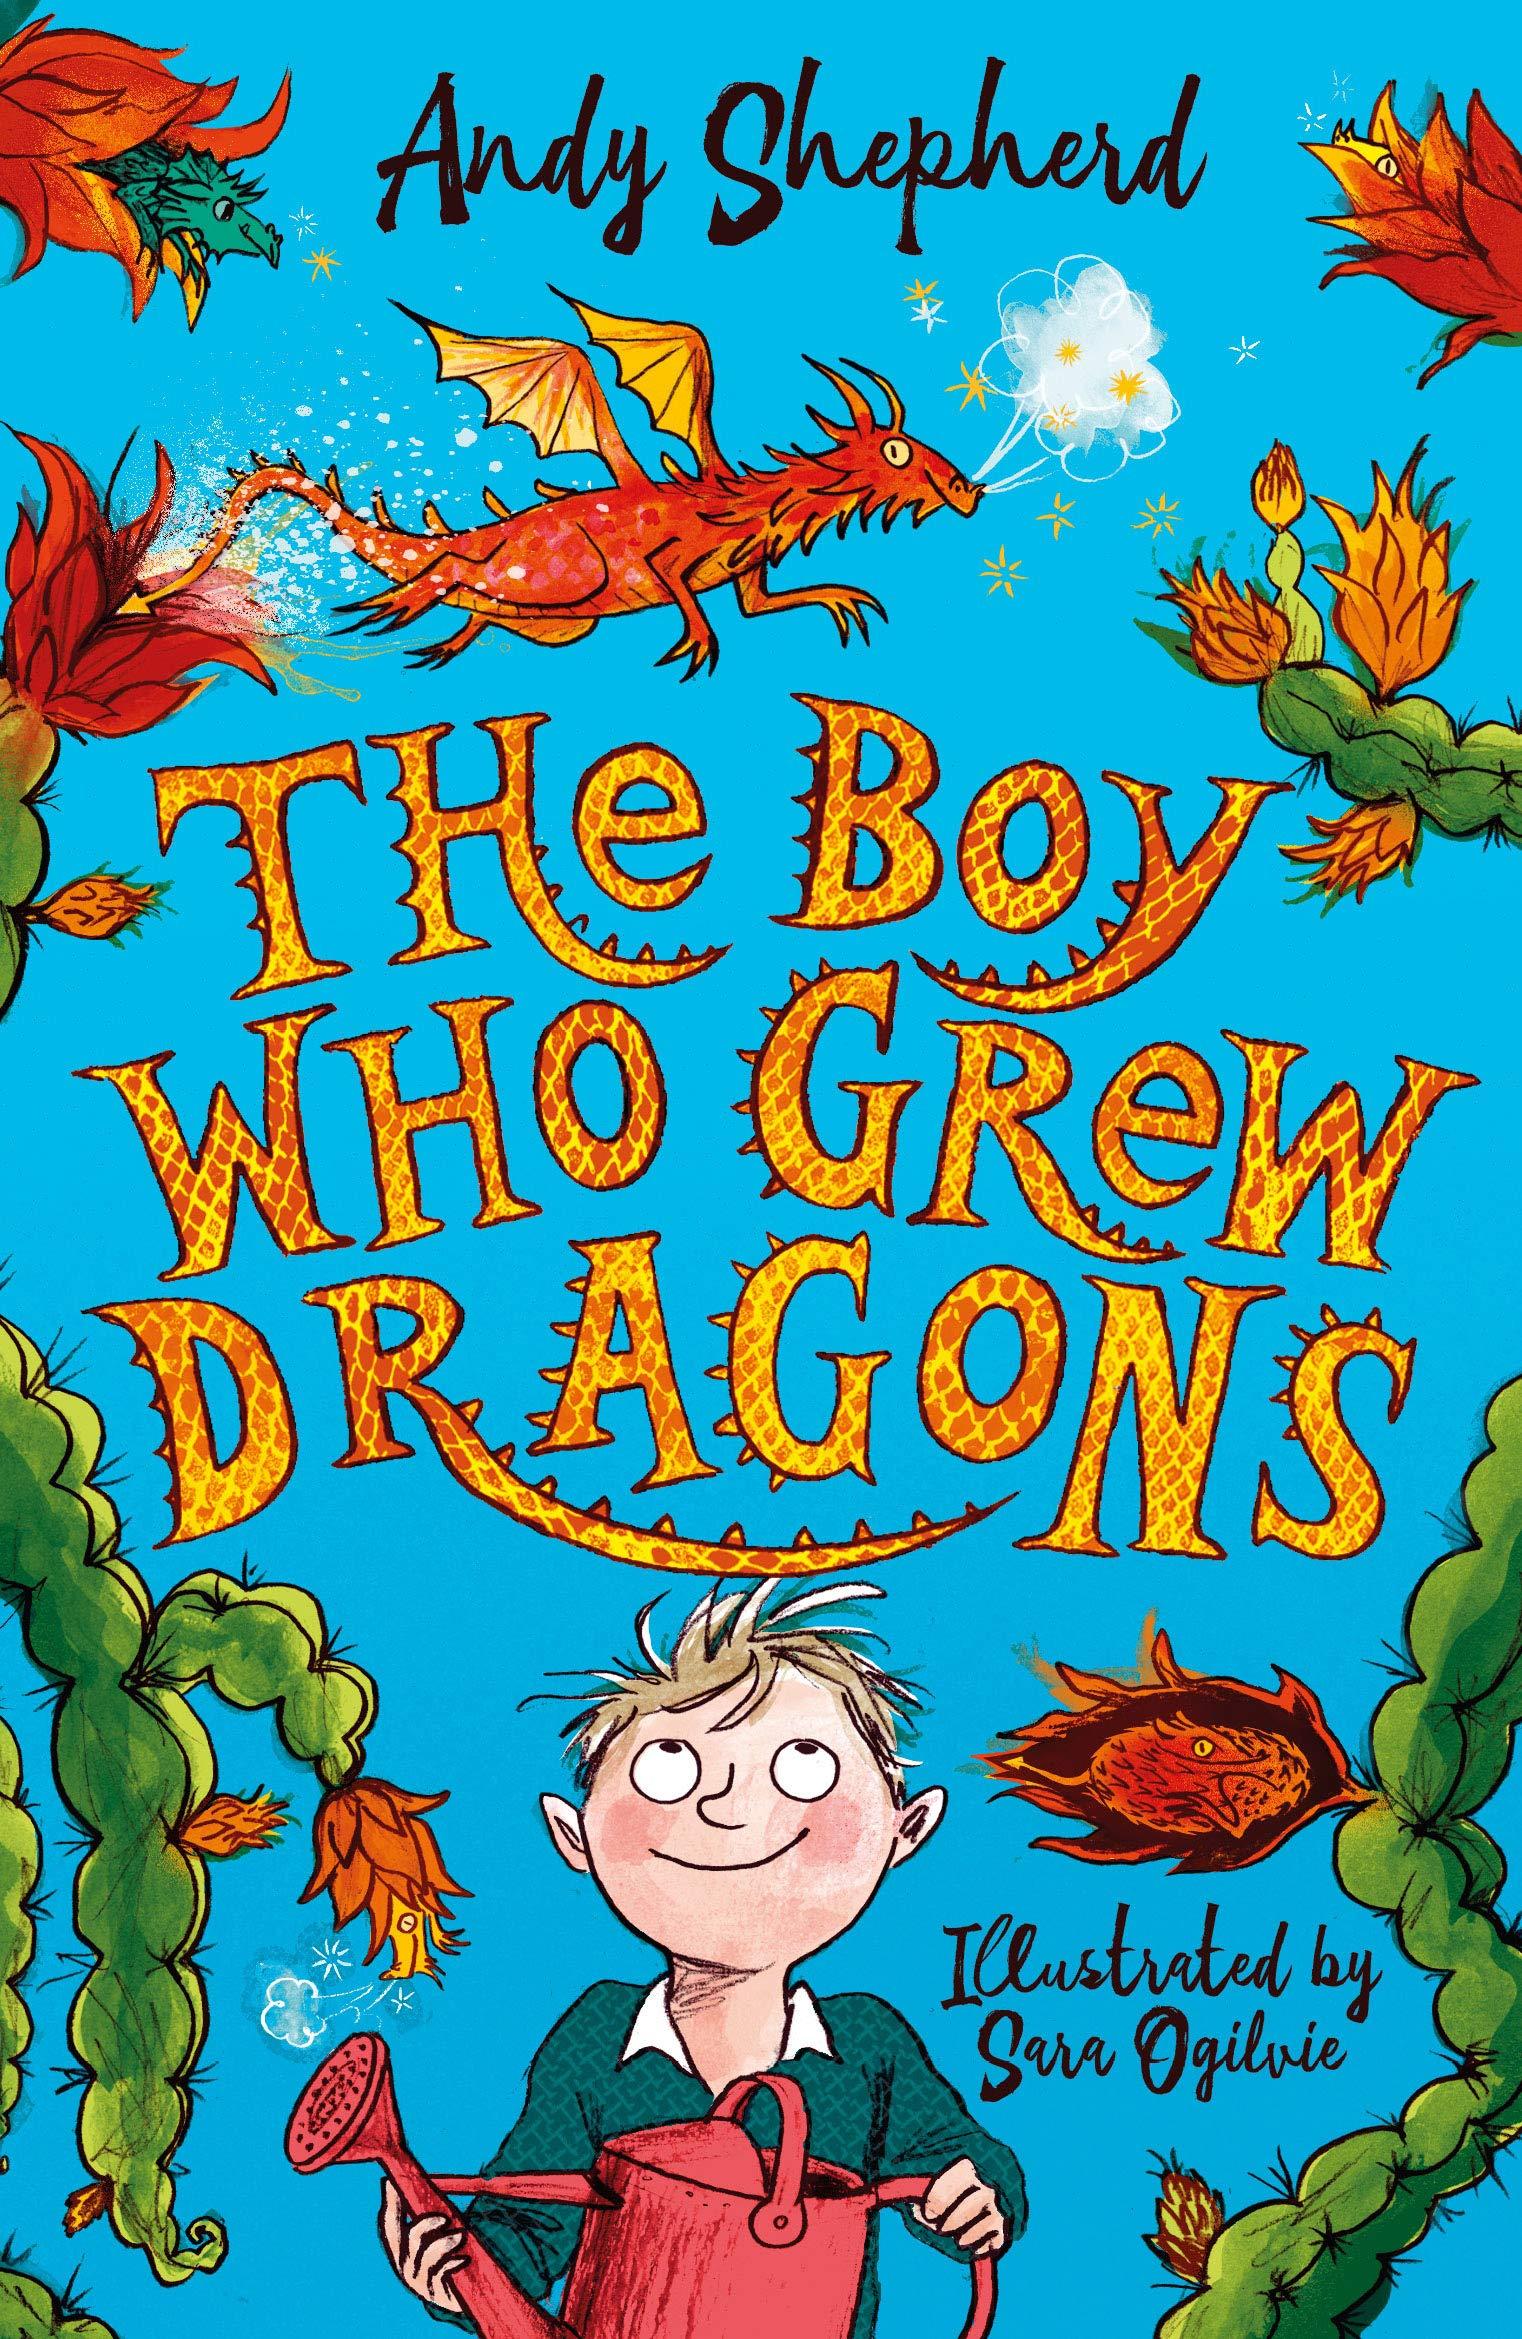 The Boy Who Grew Dragons The Boy Who Grew Dragons 1: Amazon.co.uk:  Shepherd, Andy, Ogilvie, Sara: Books